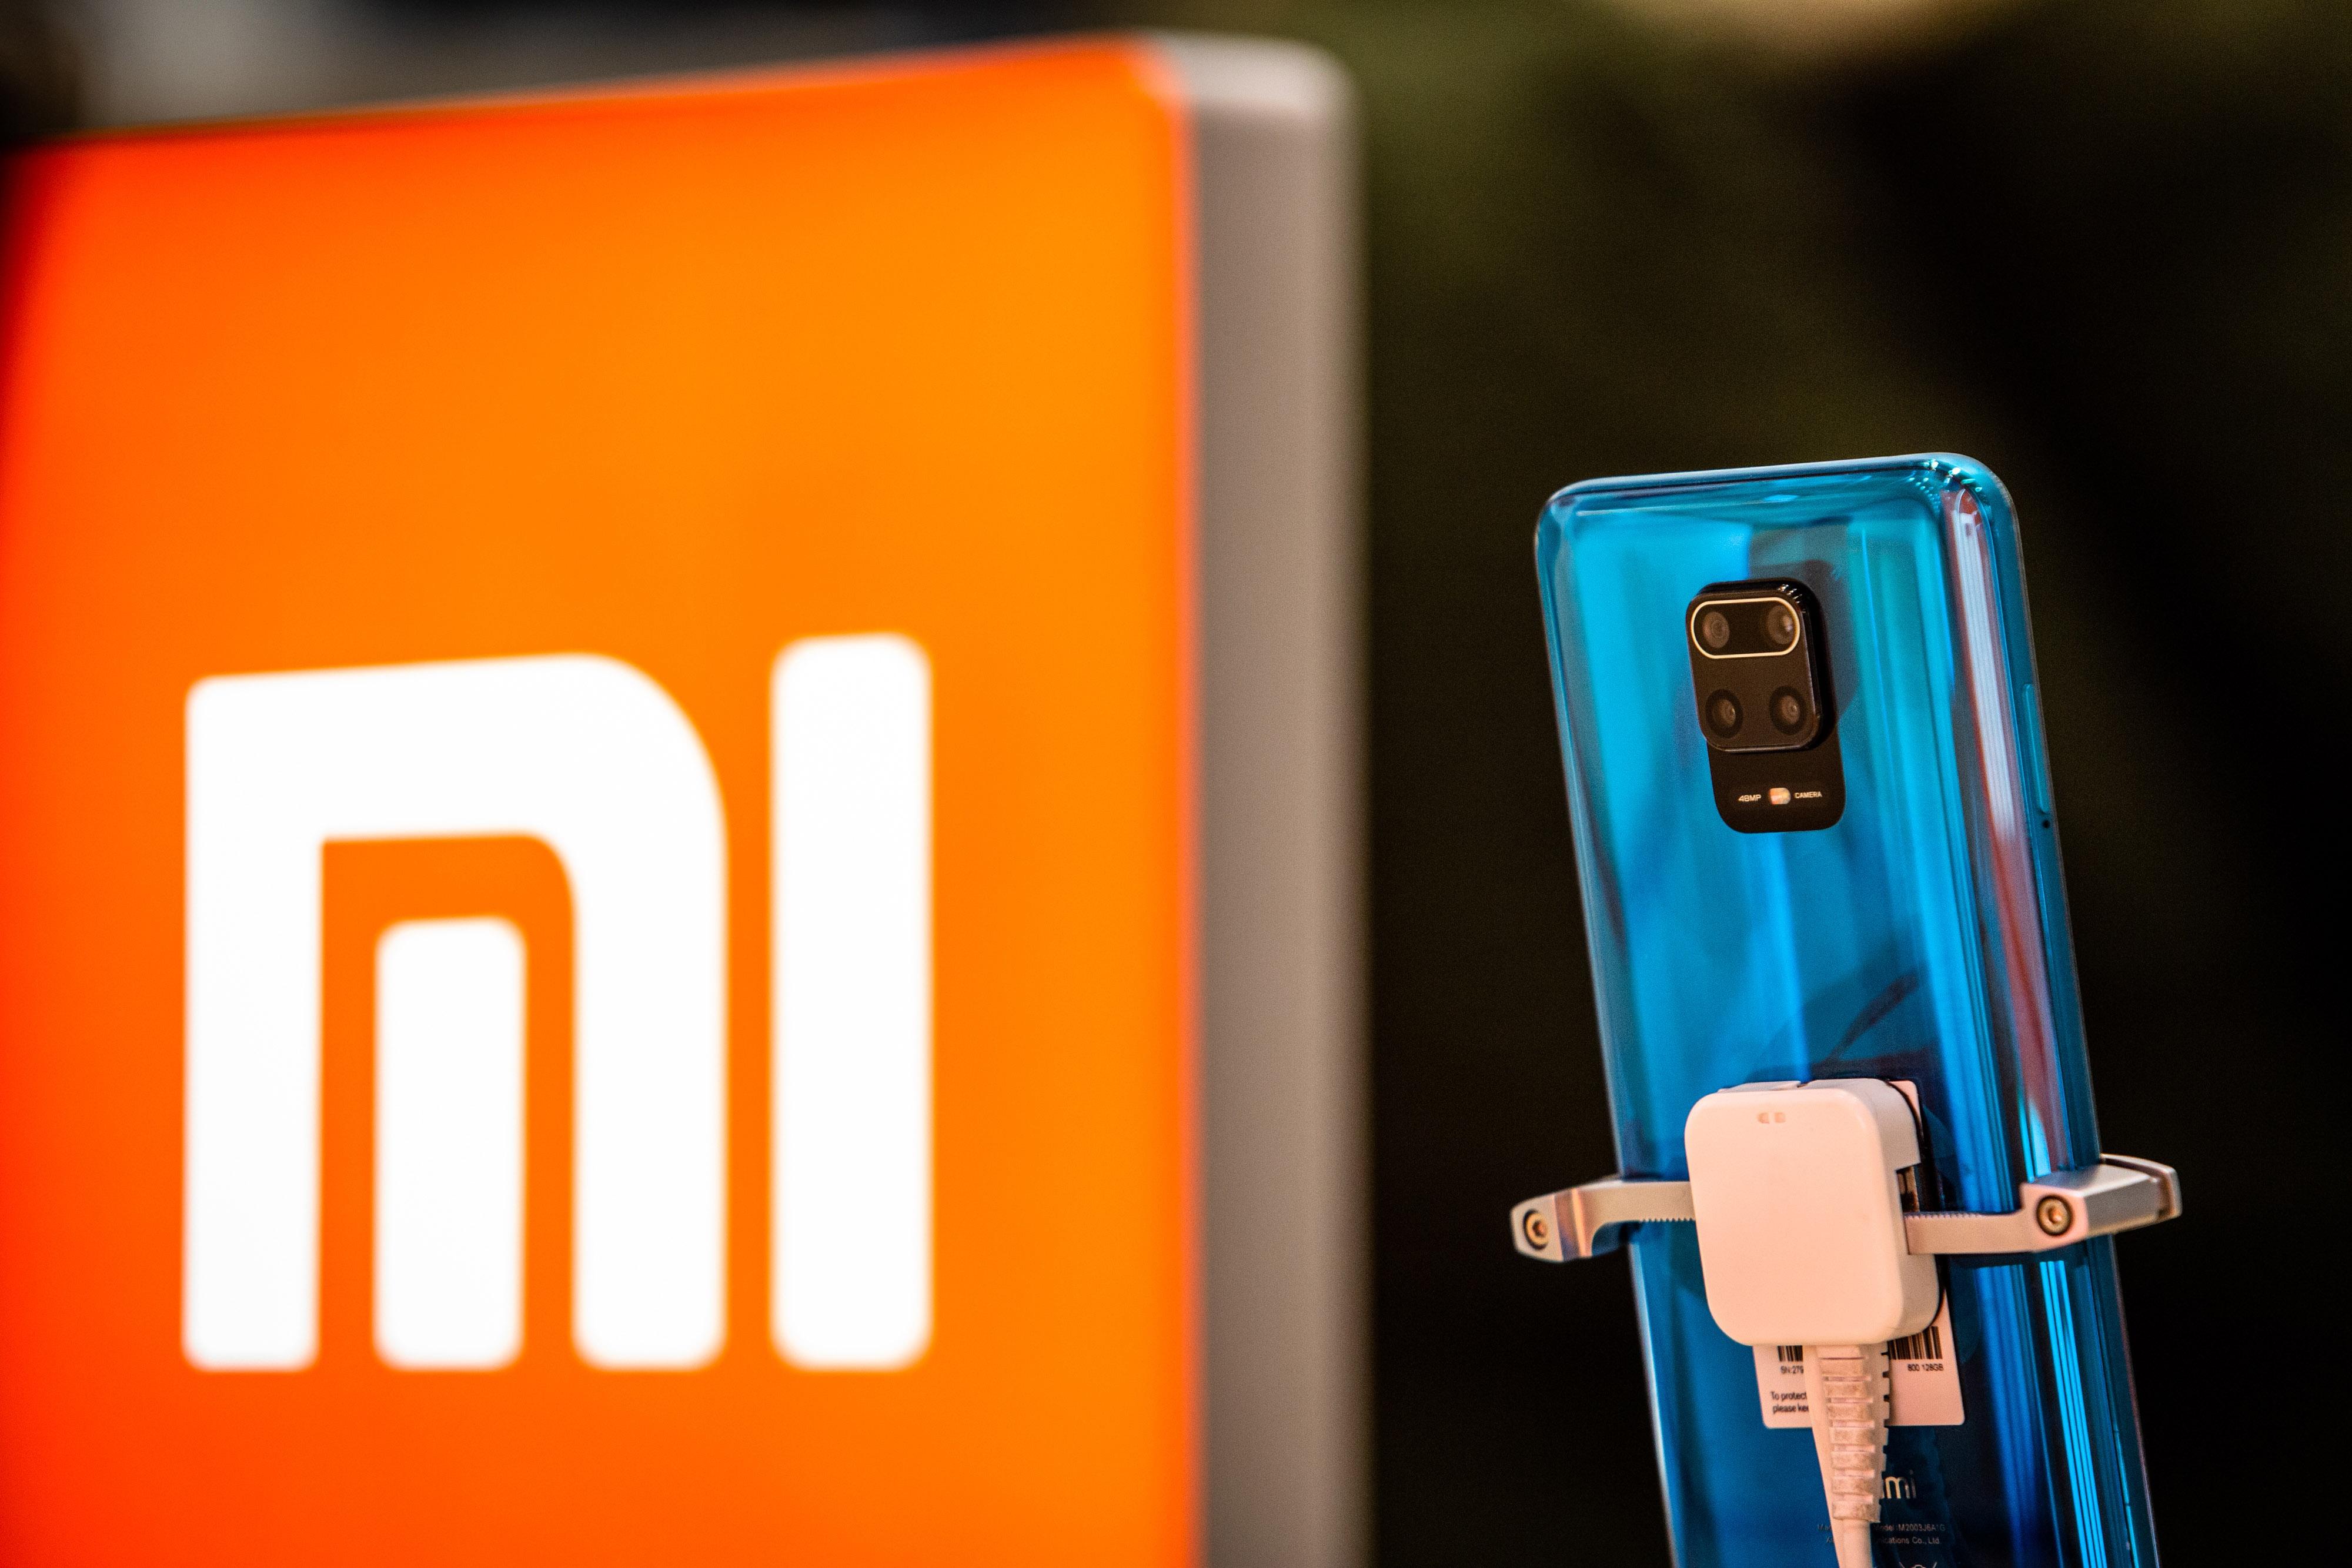 Thi phan smartphone Xiaomi anh 2